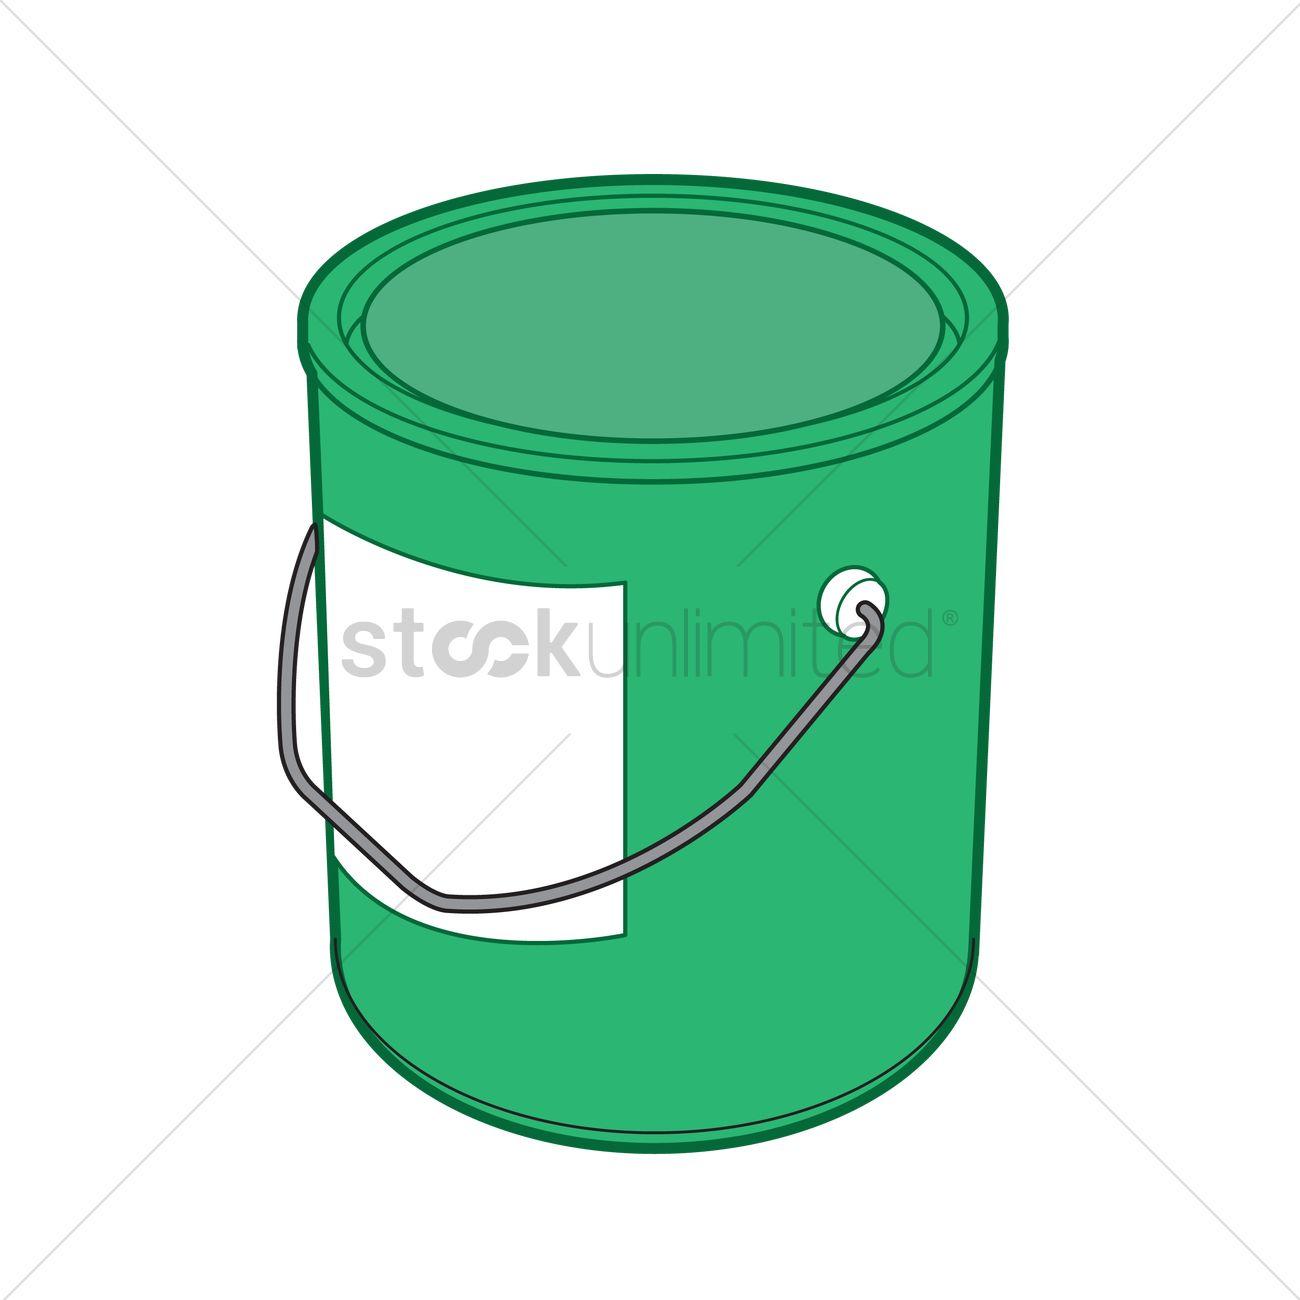 1300x1300 A Paint Bucket Vector Image